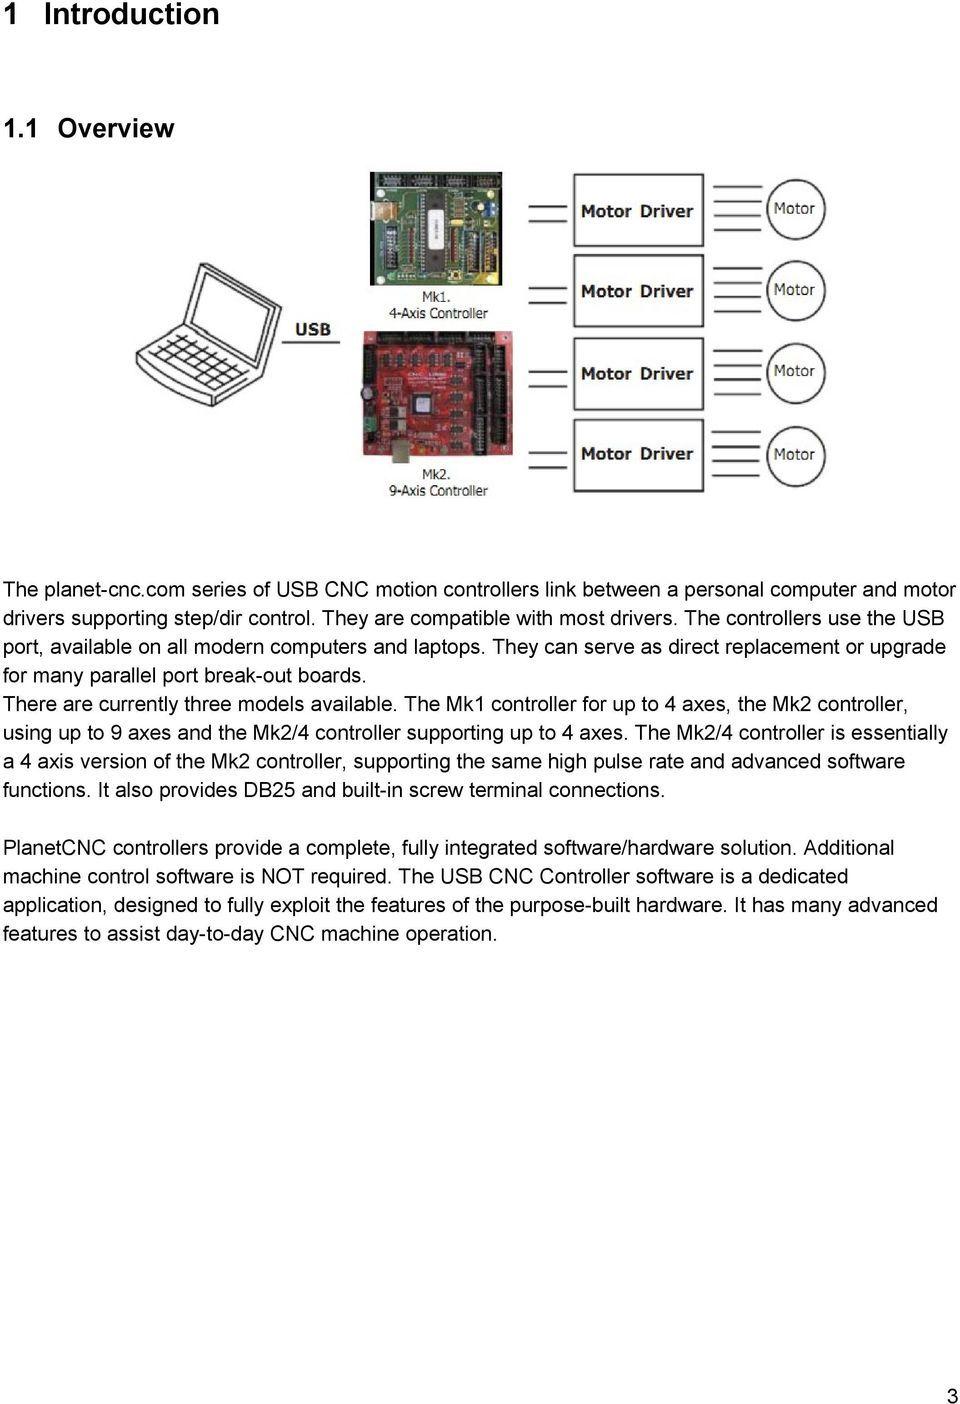 CNC USB Controller  User manual - PDF | Cnc software in 2019